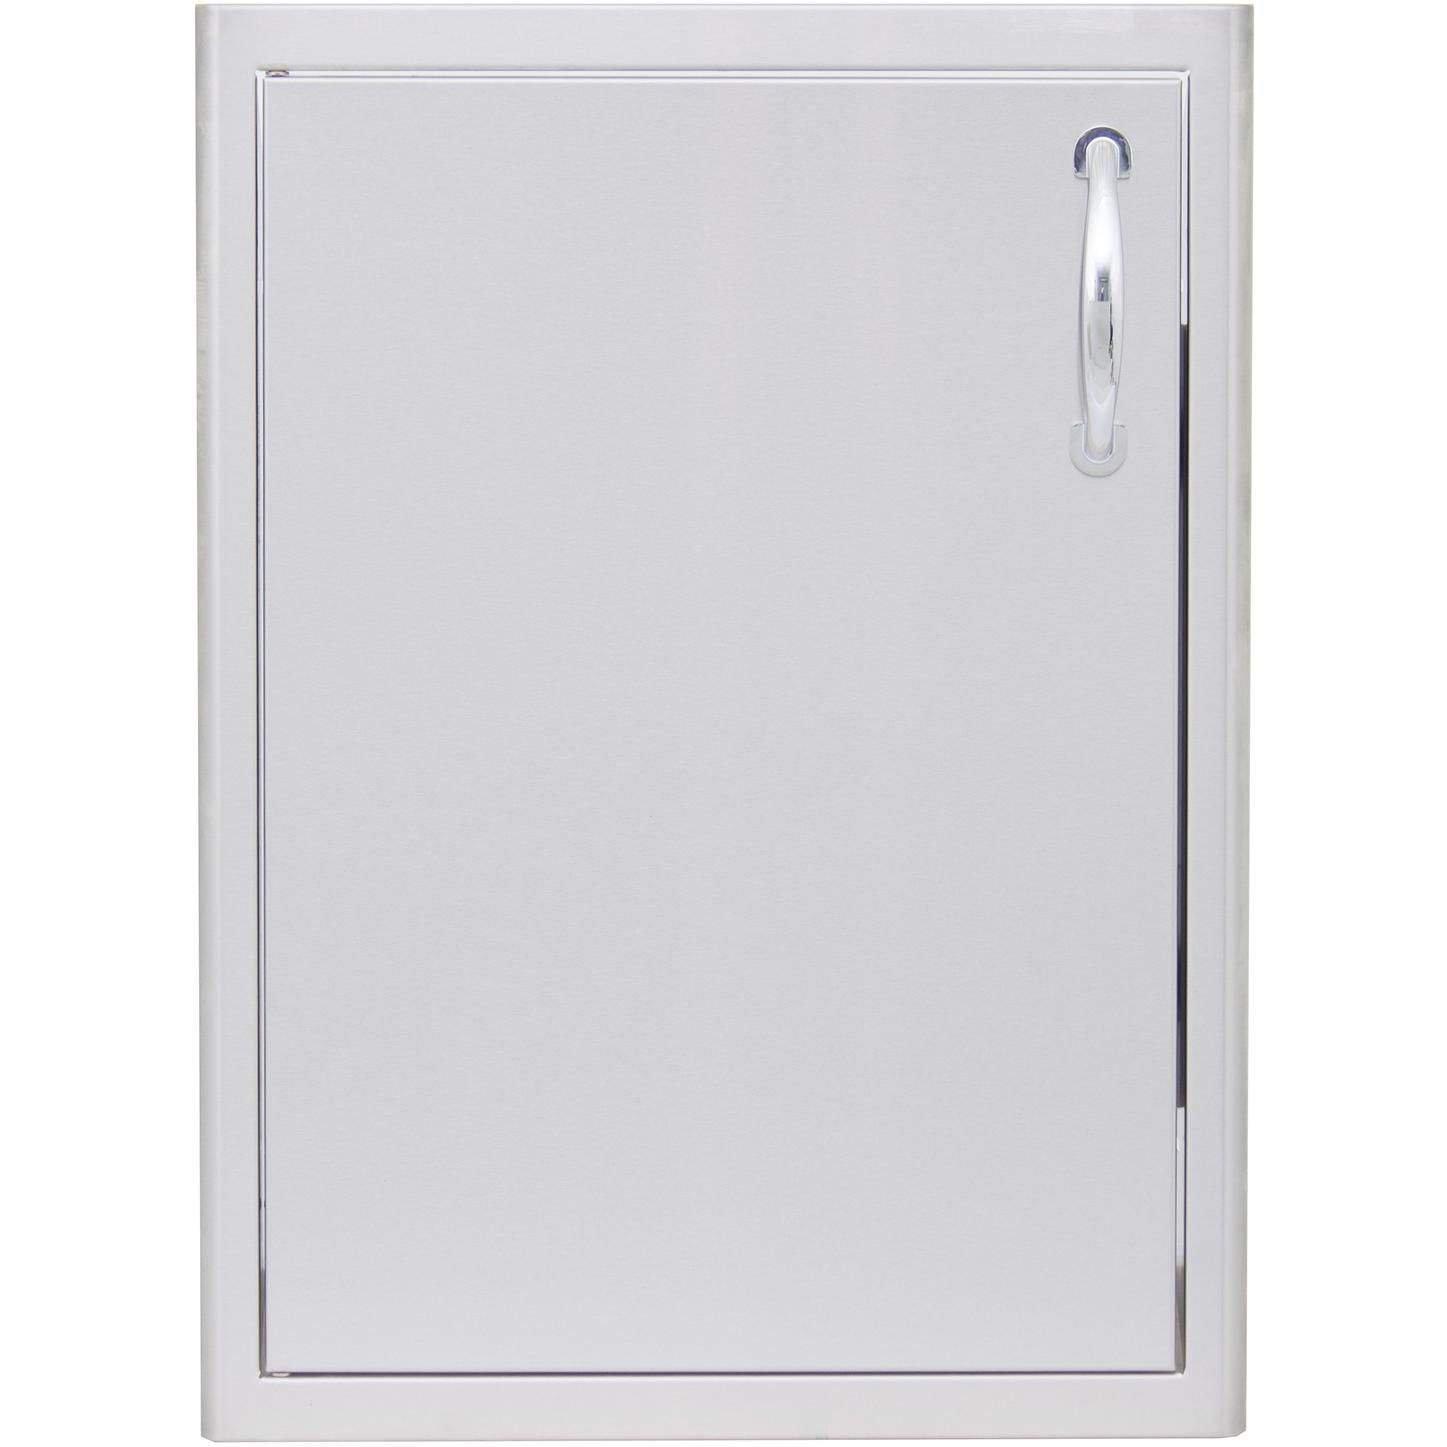 Blaze Left Hinged Single Access Door (BLZ-SINGLE-2417-R-LH), 24x17-inches